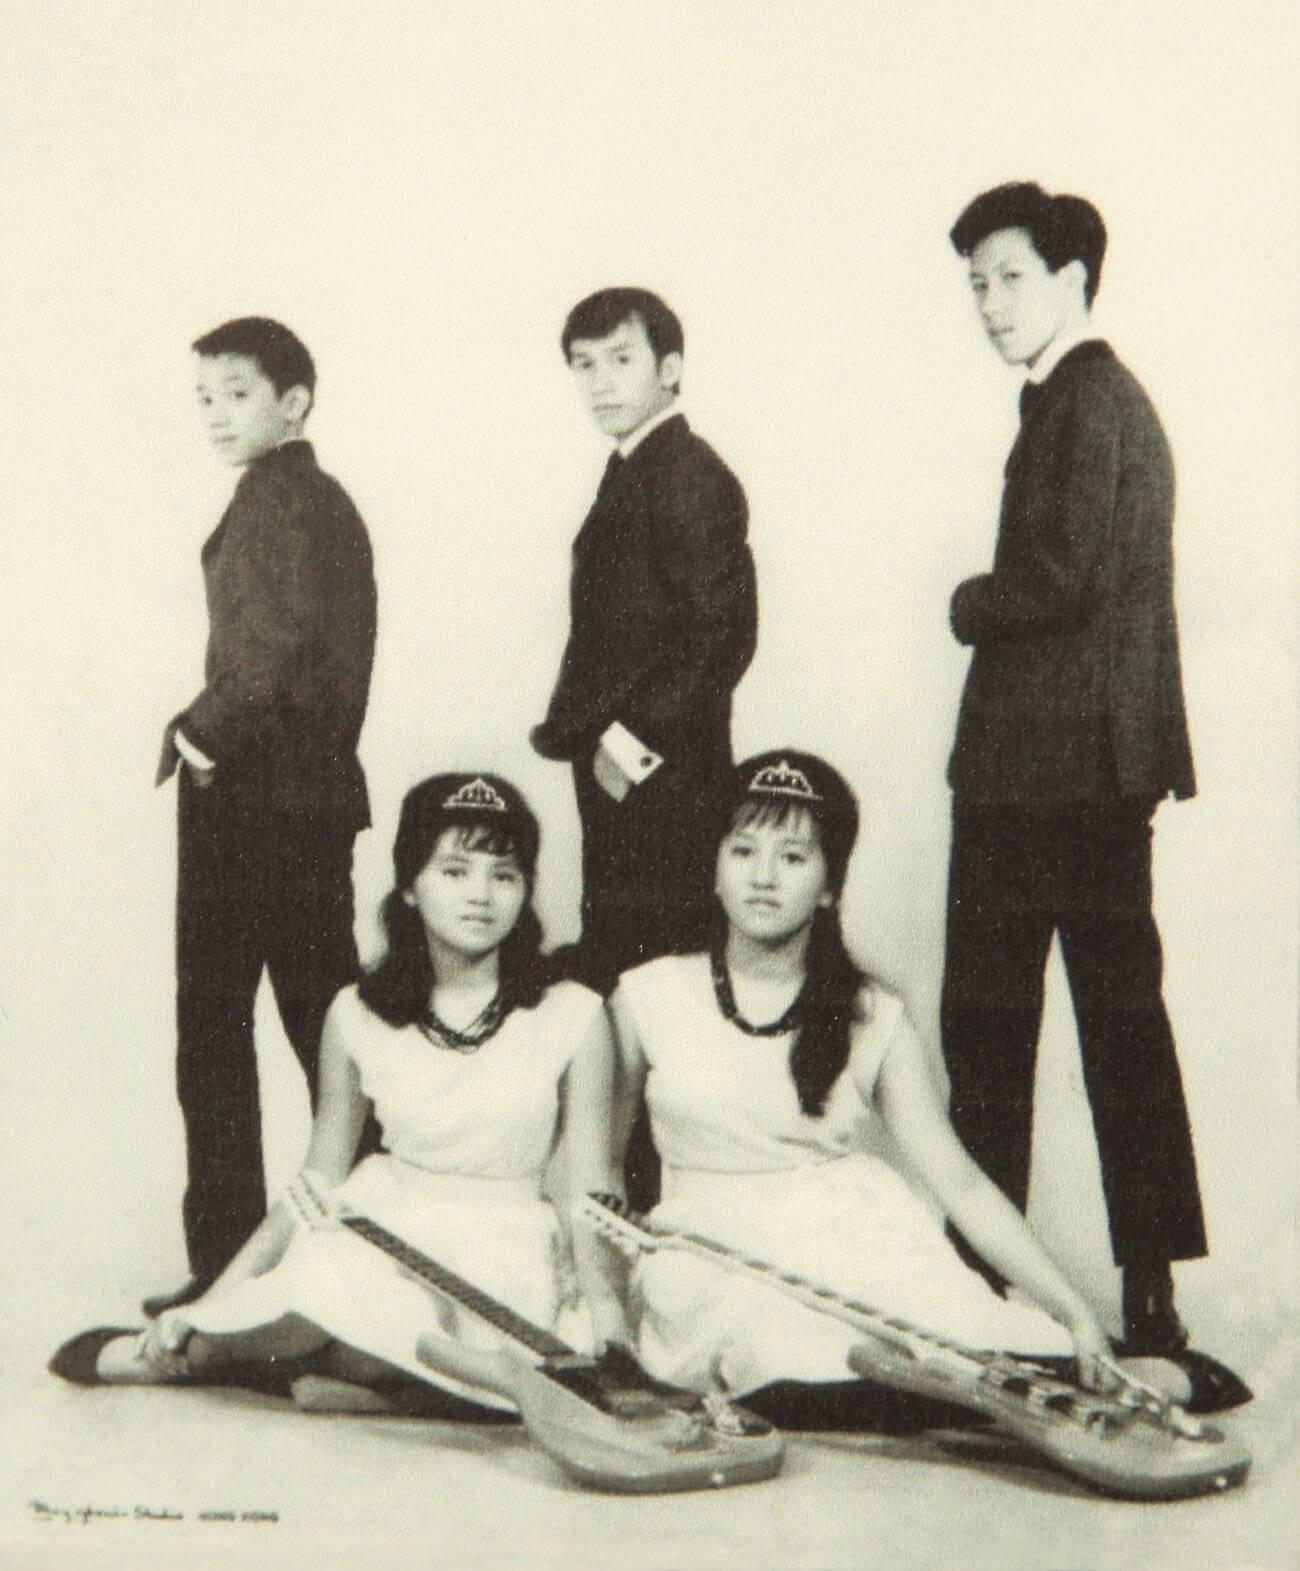 Top Notes時代五人組合,Joe Junior(中)是男主音,前面兩位Samson姊妹花也有份唱。